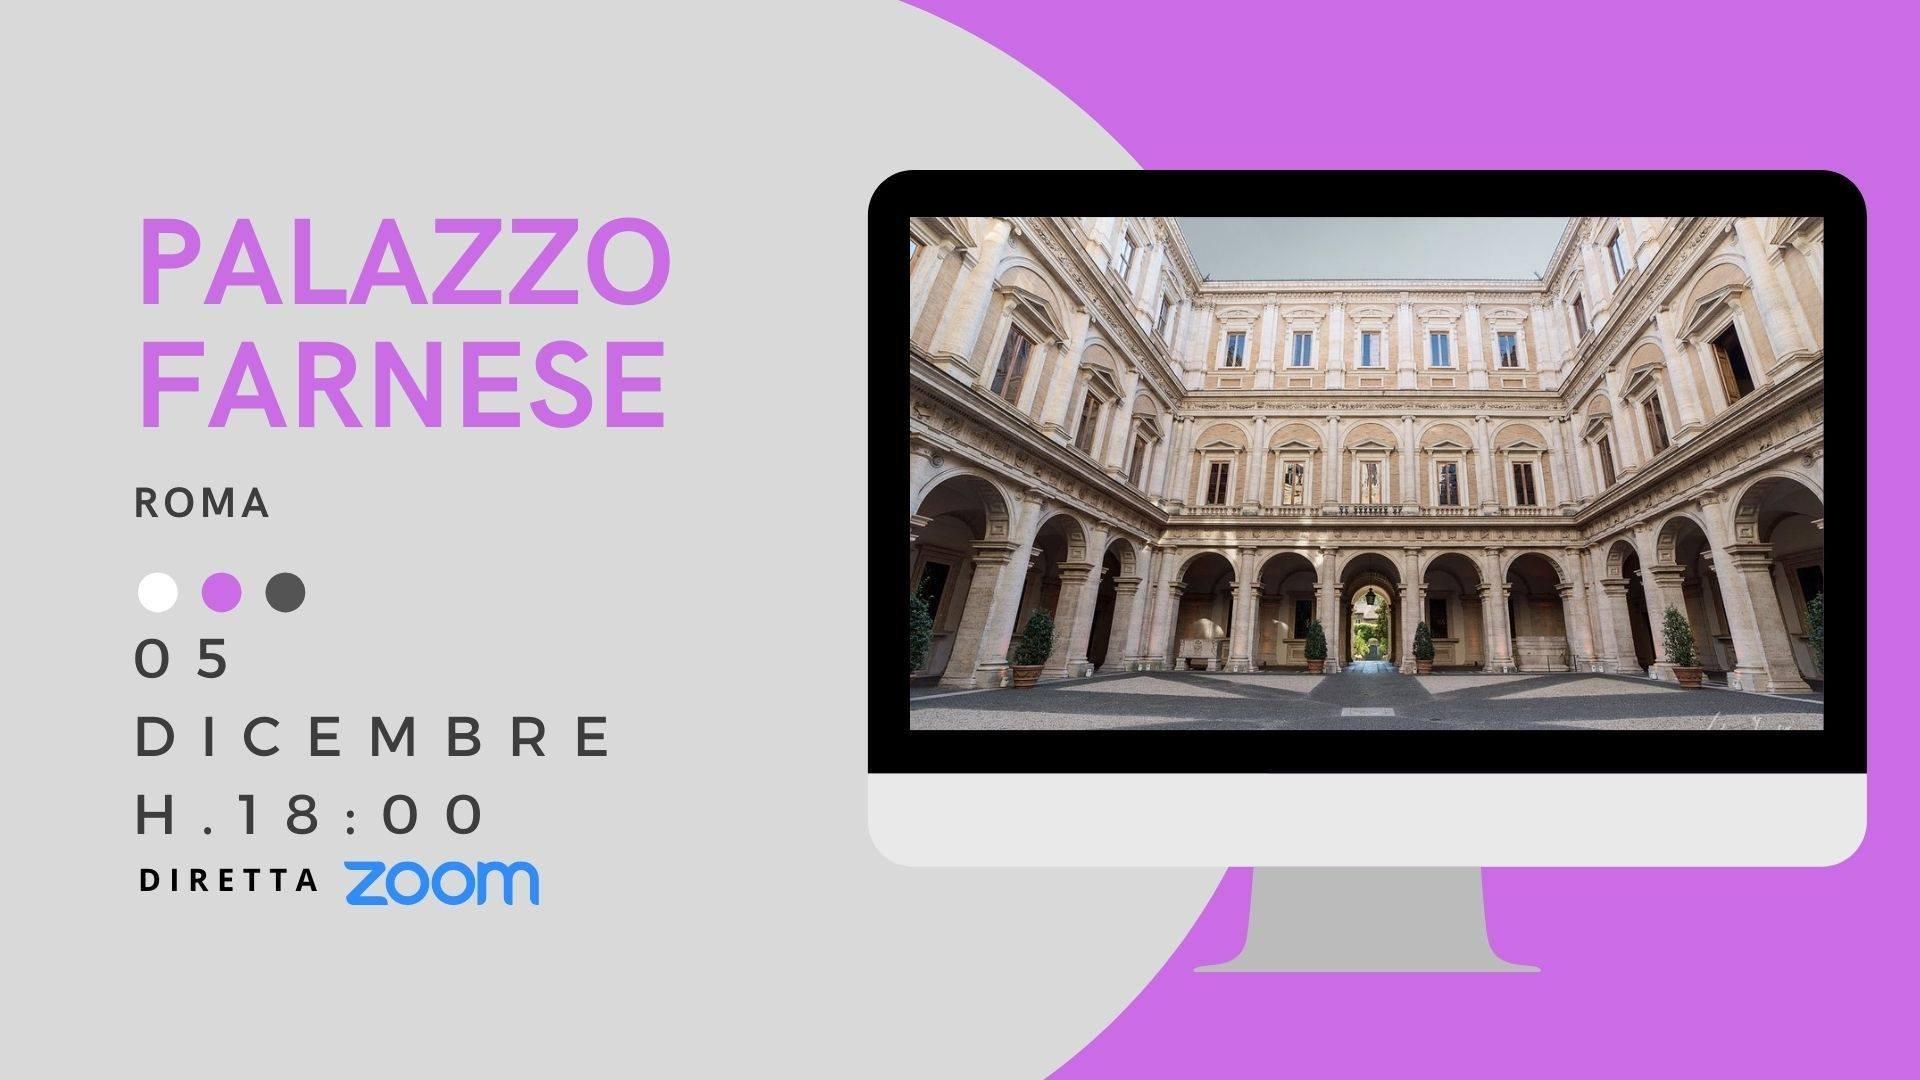 Palazzo Farnese in Rome ONLINE